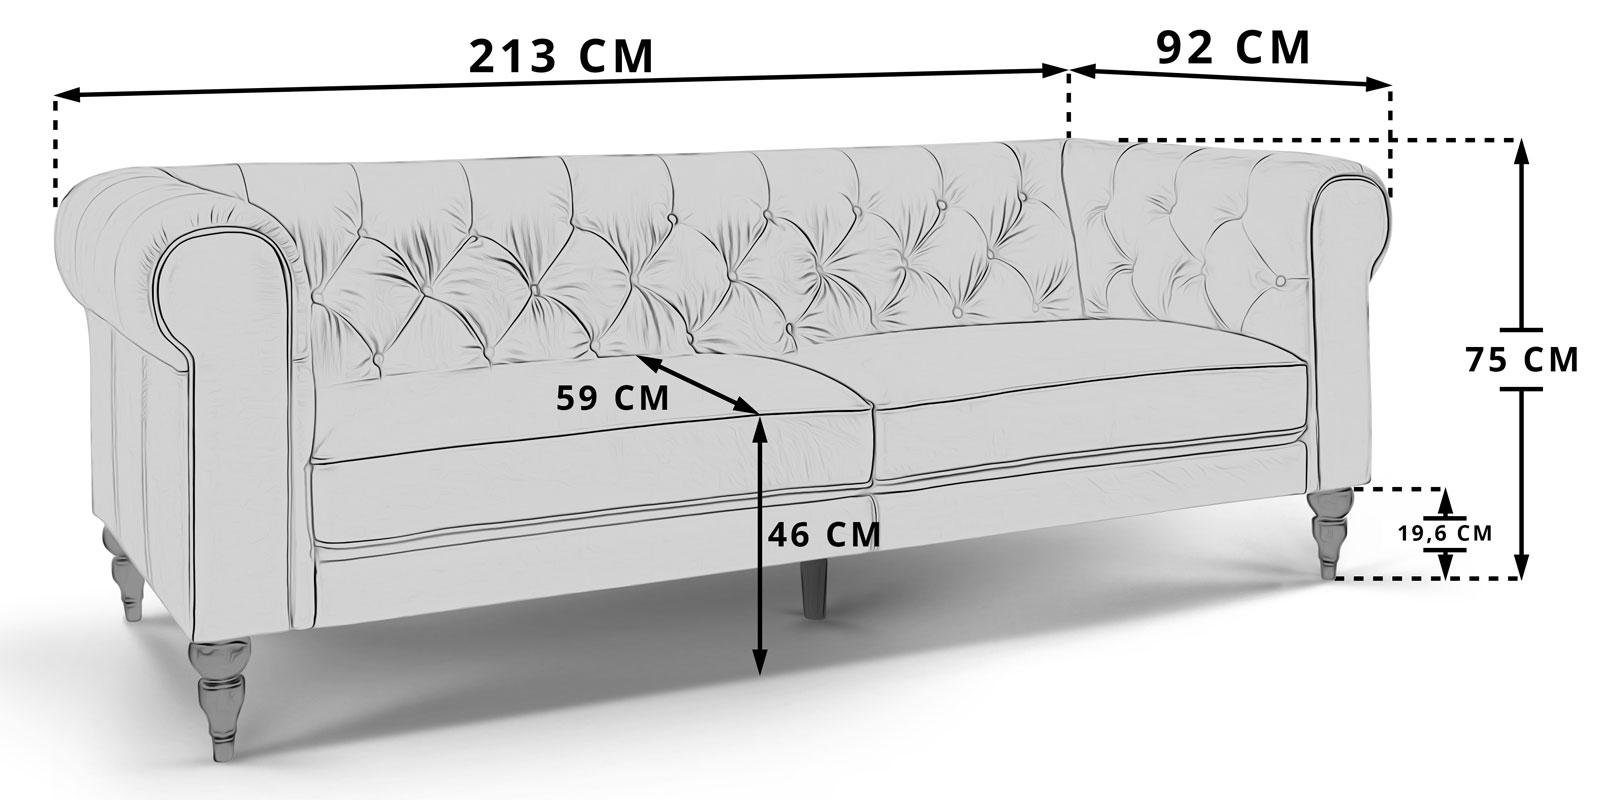 Moebella24 - Chesterfield - 3-Sitzer - Sofa - Hudson - Skizze - Maße